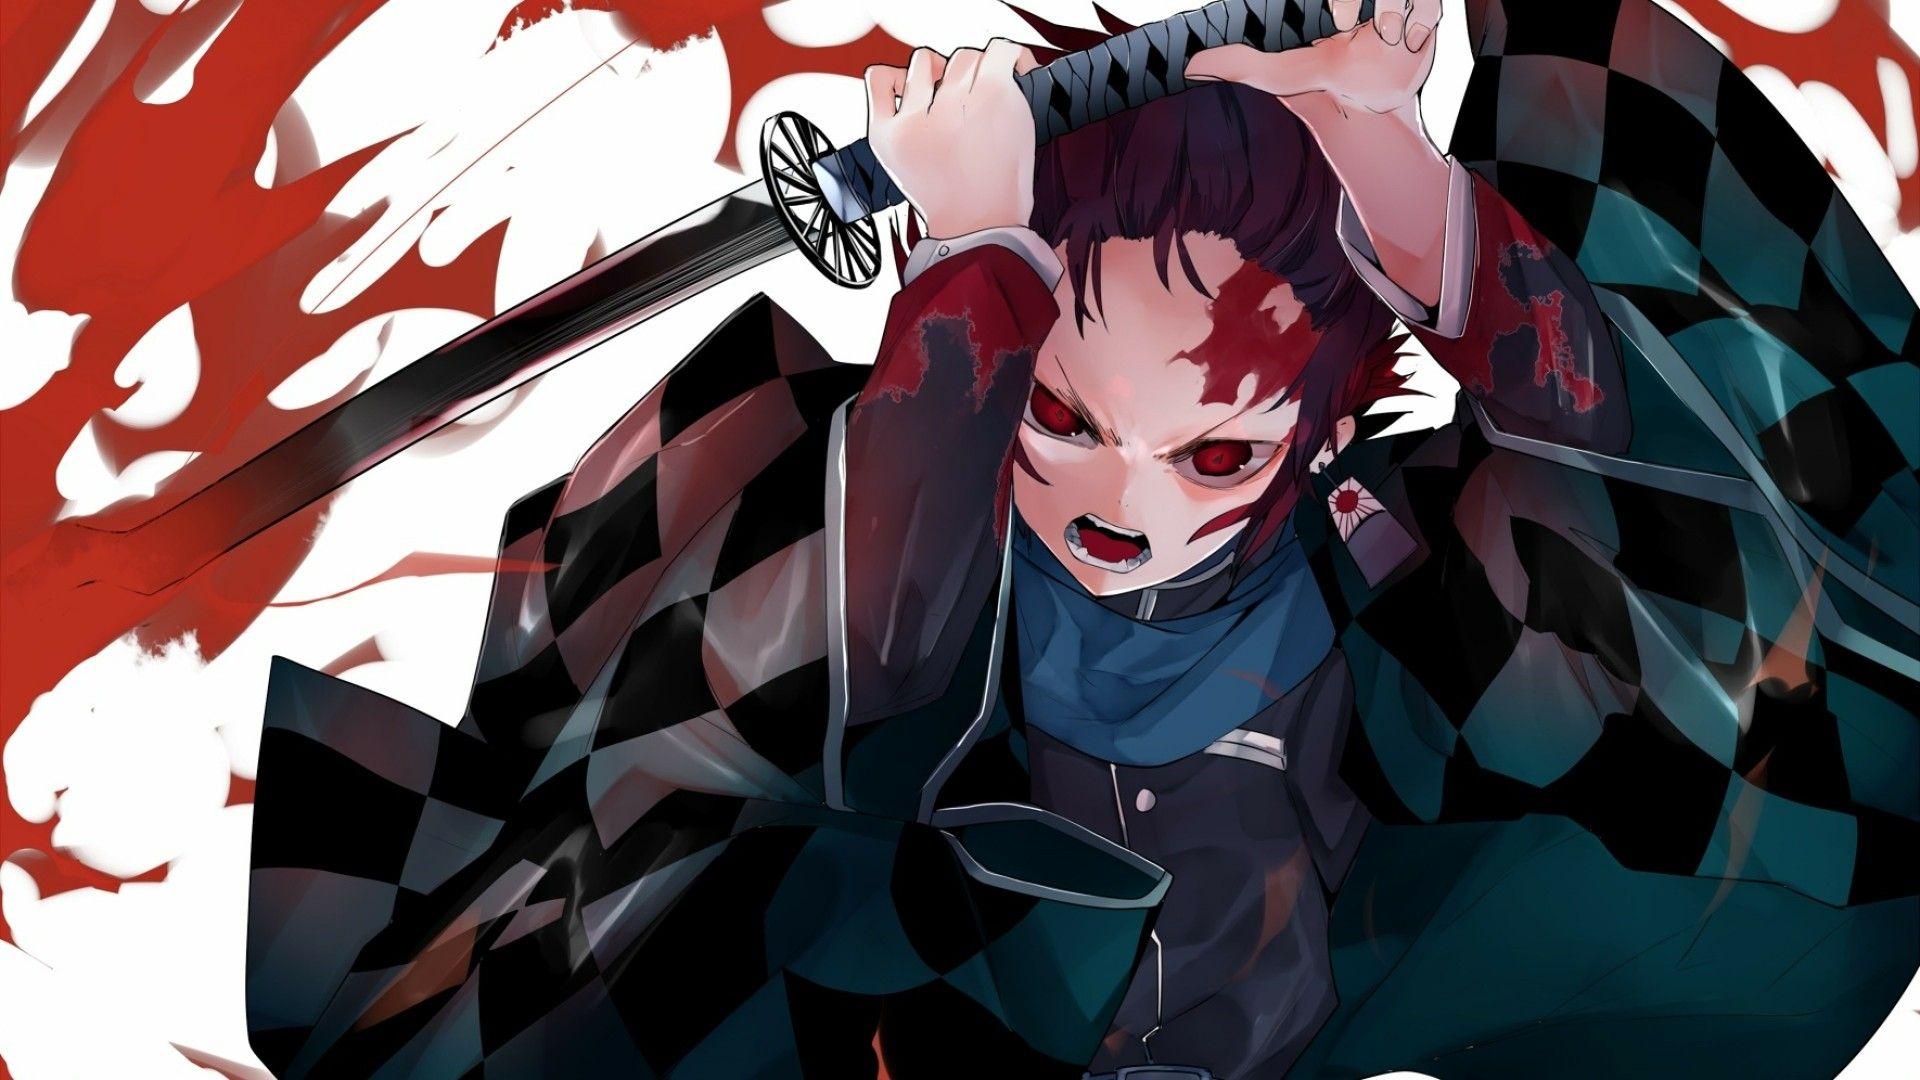 kimetsunoyaba tanjiro demonslayer fanart Anime